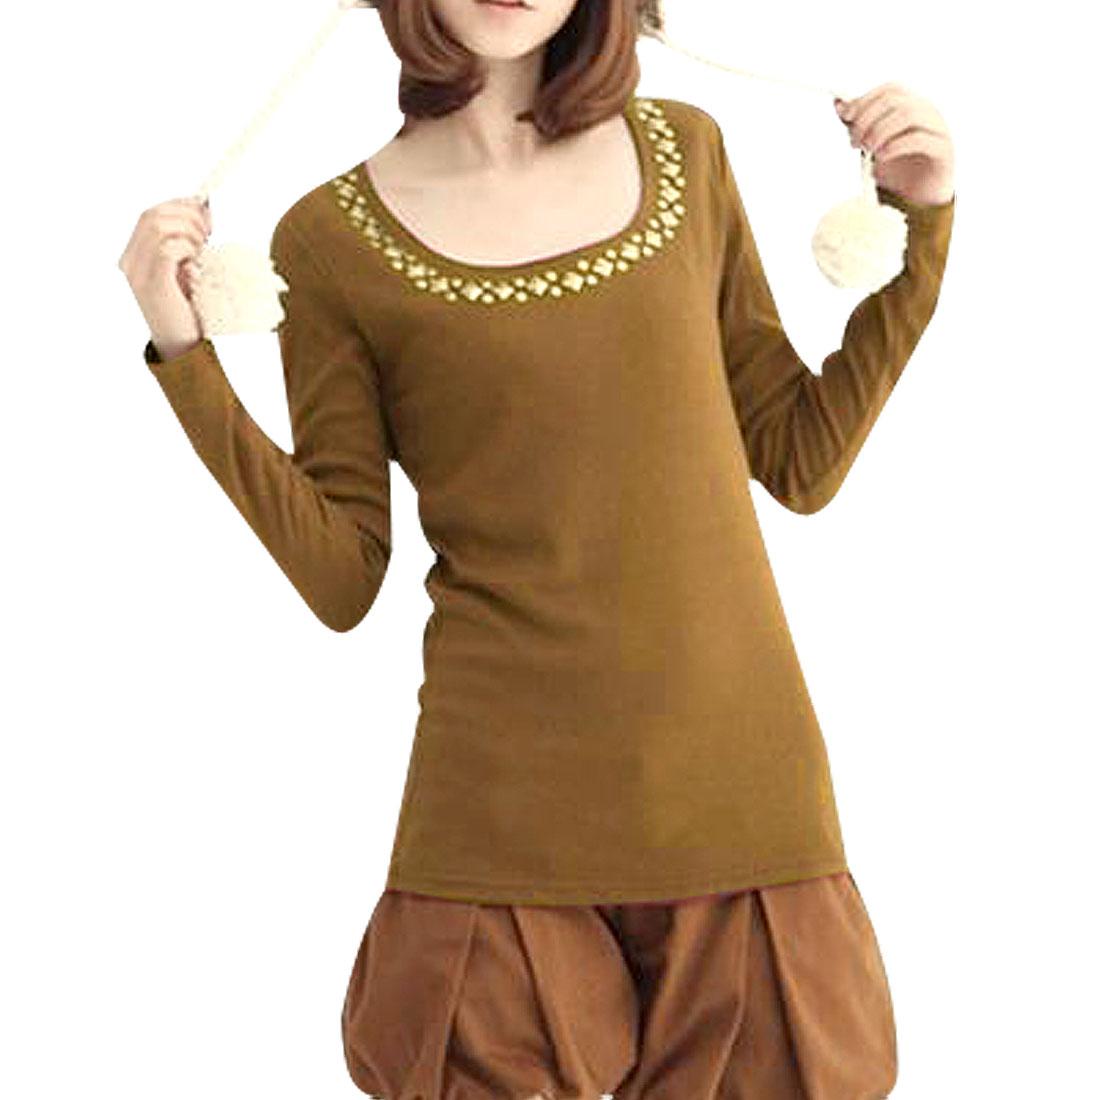 Ladies Yellow Brown Cotton Long Sleeve Round Neck Shirt Size XS